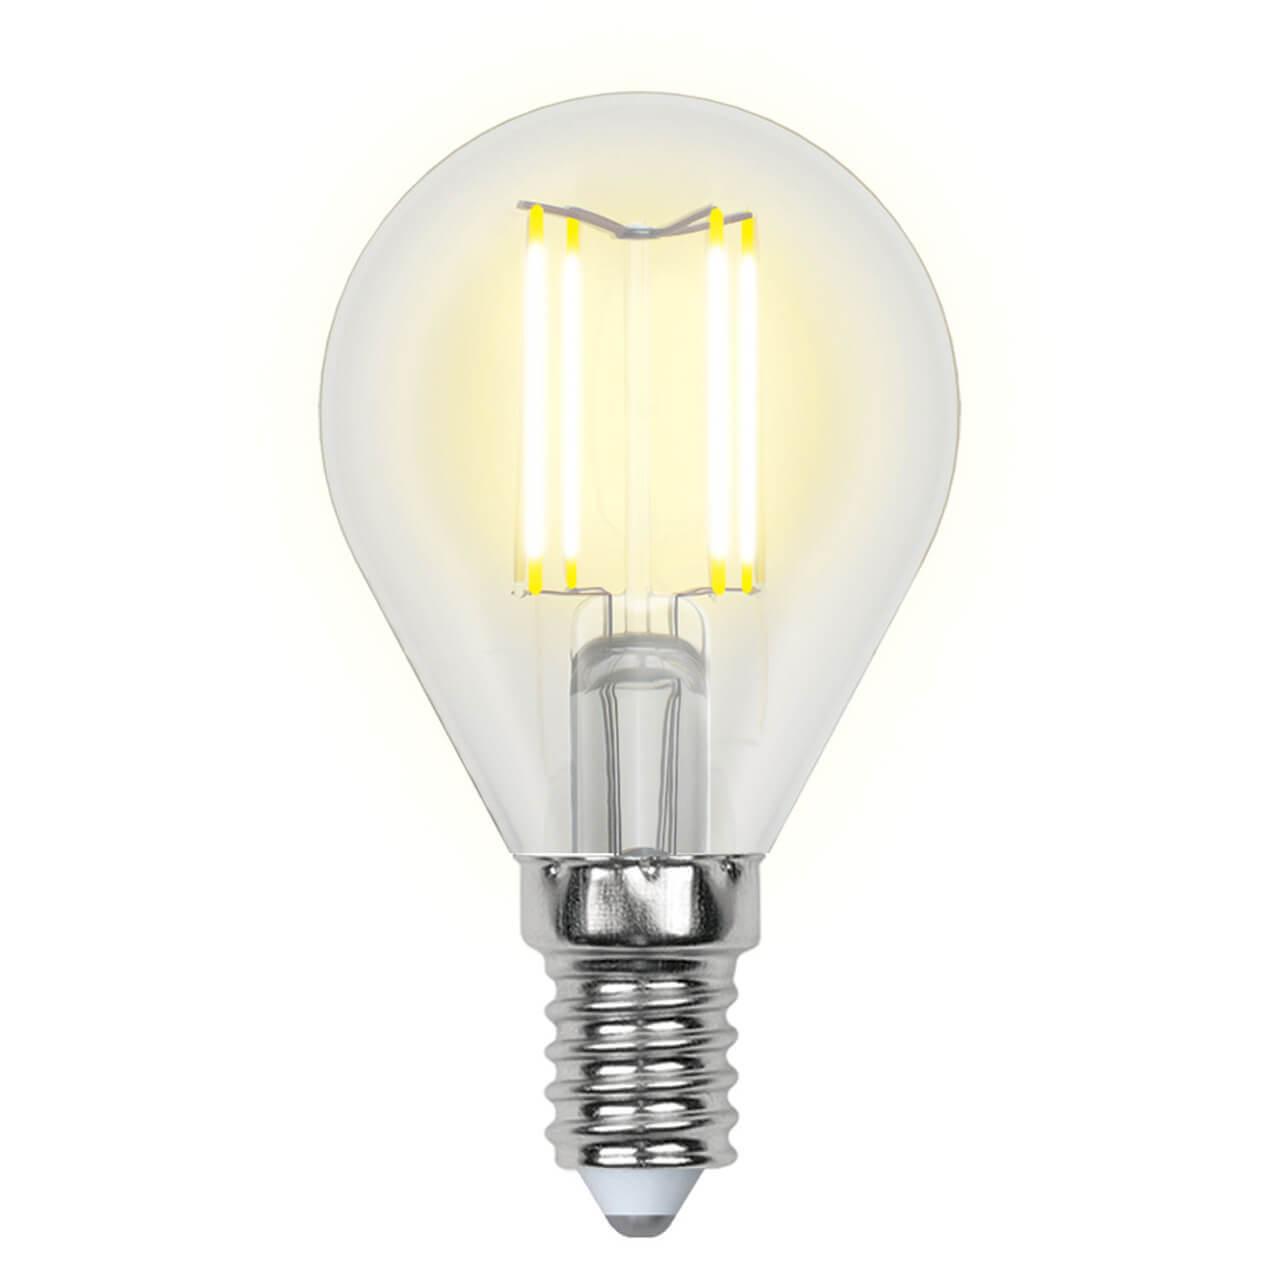 цена на Лампочка Uniel LED-G45-6W/NW/E14/CL GLA01TR AIR G